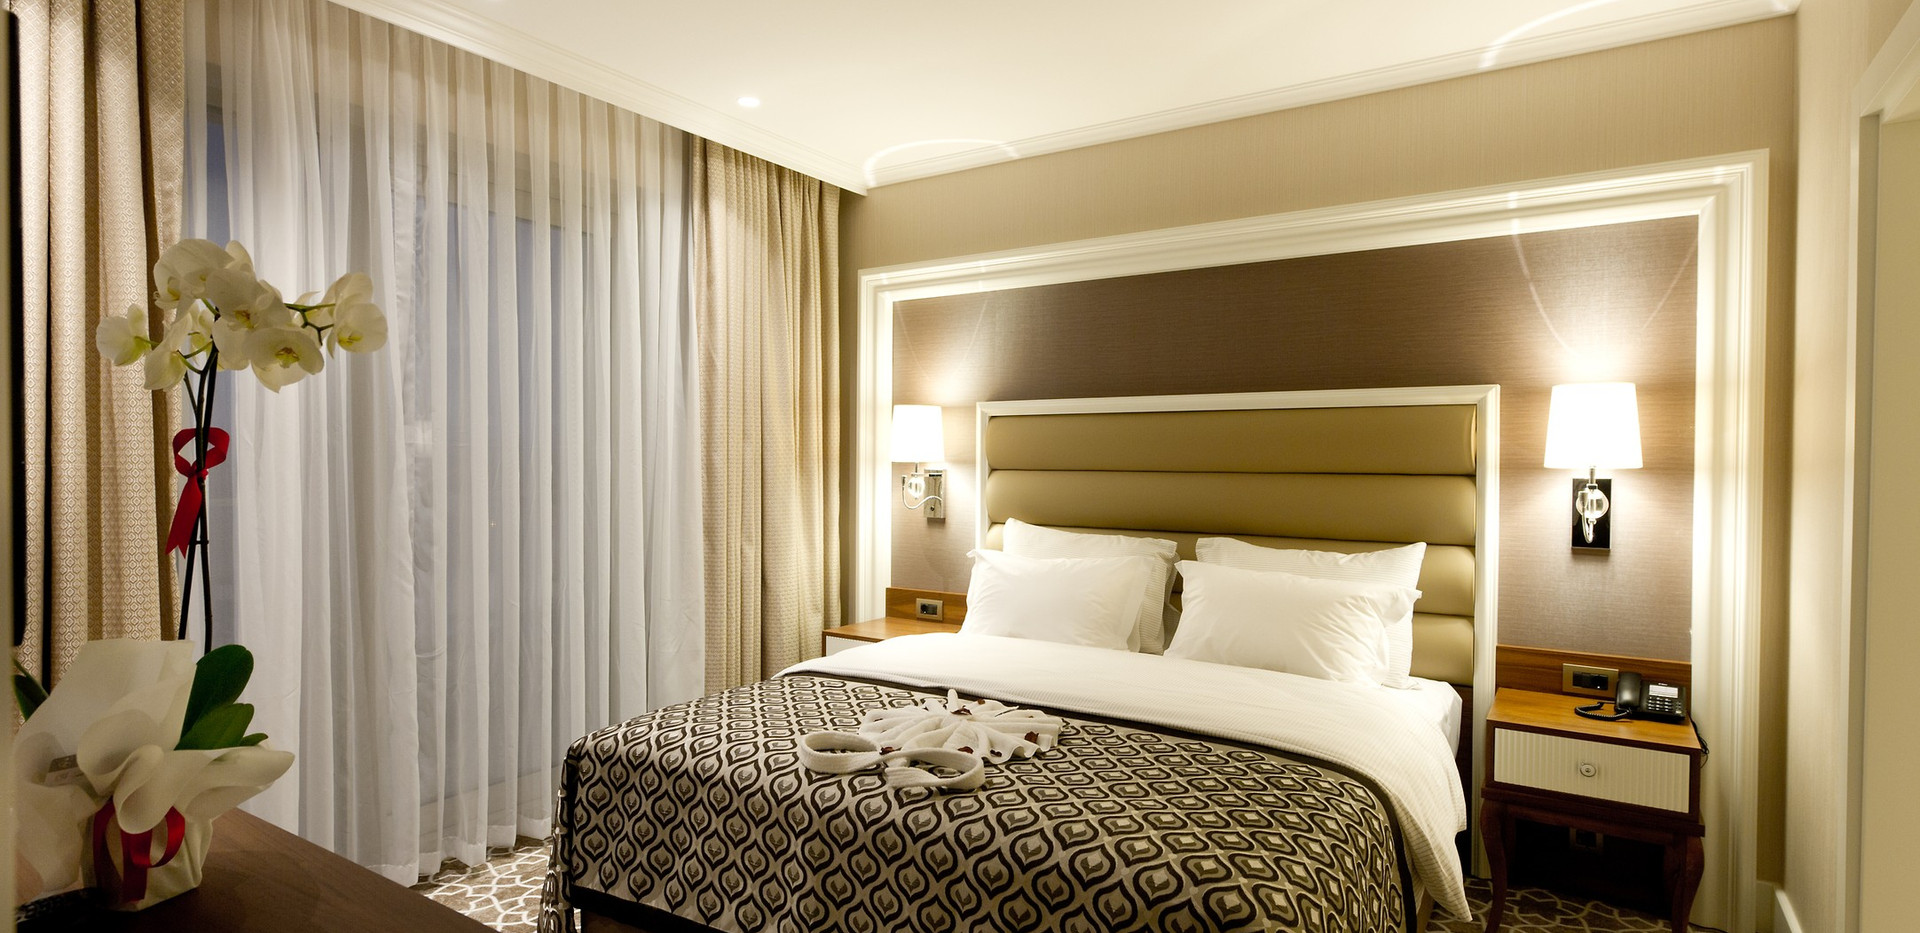 Nil-Luxury-Thermal-Hotel---Spa-Oda-70247